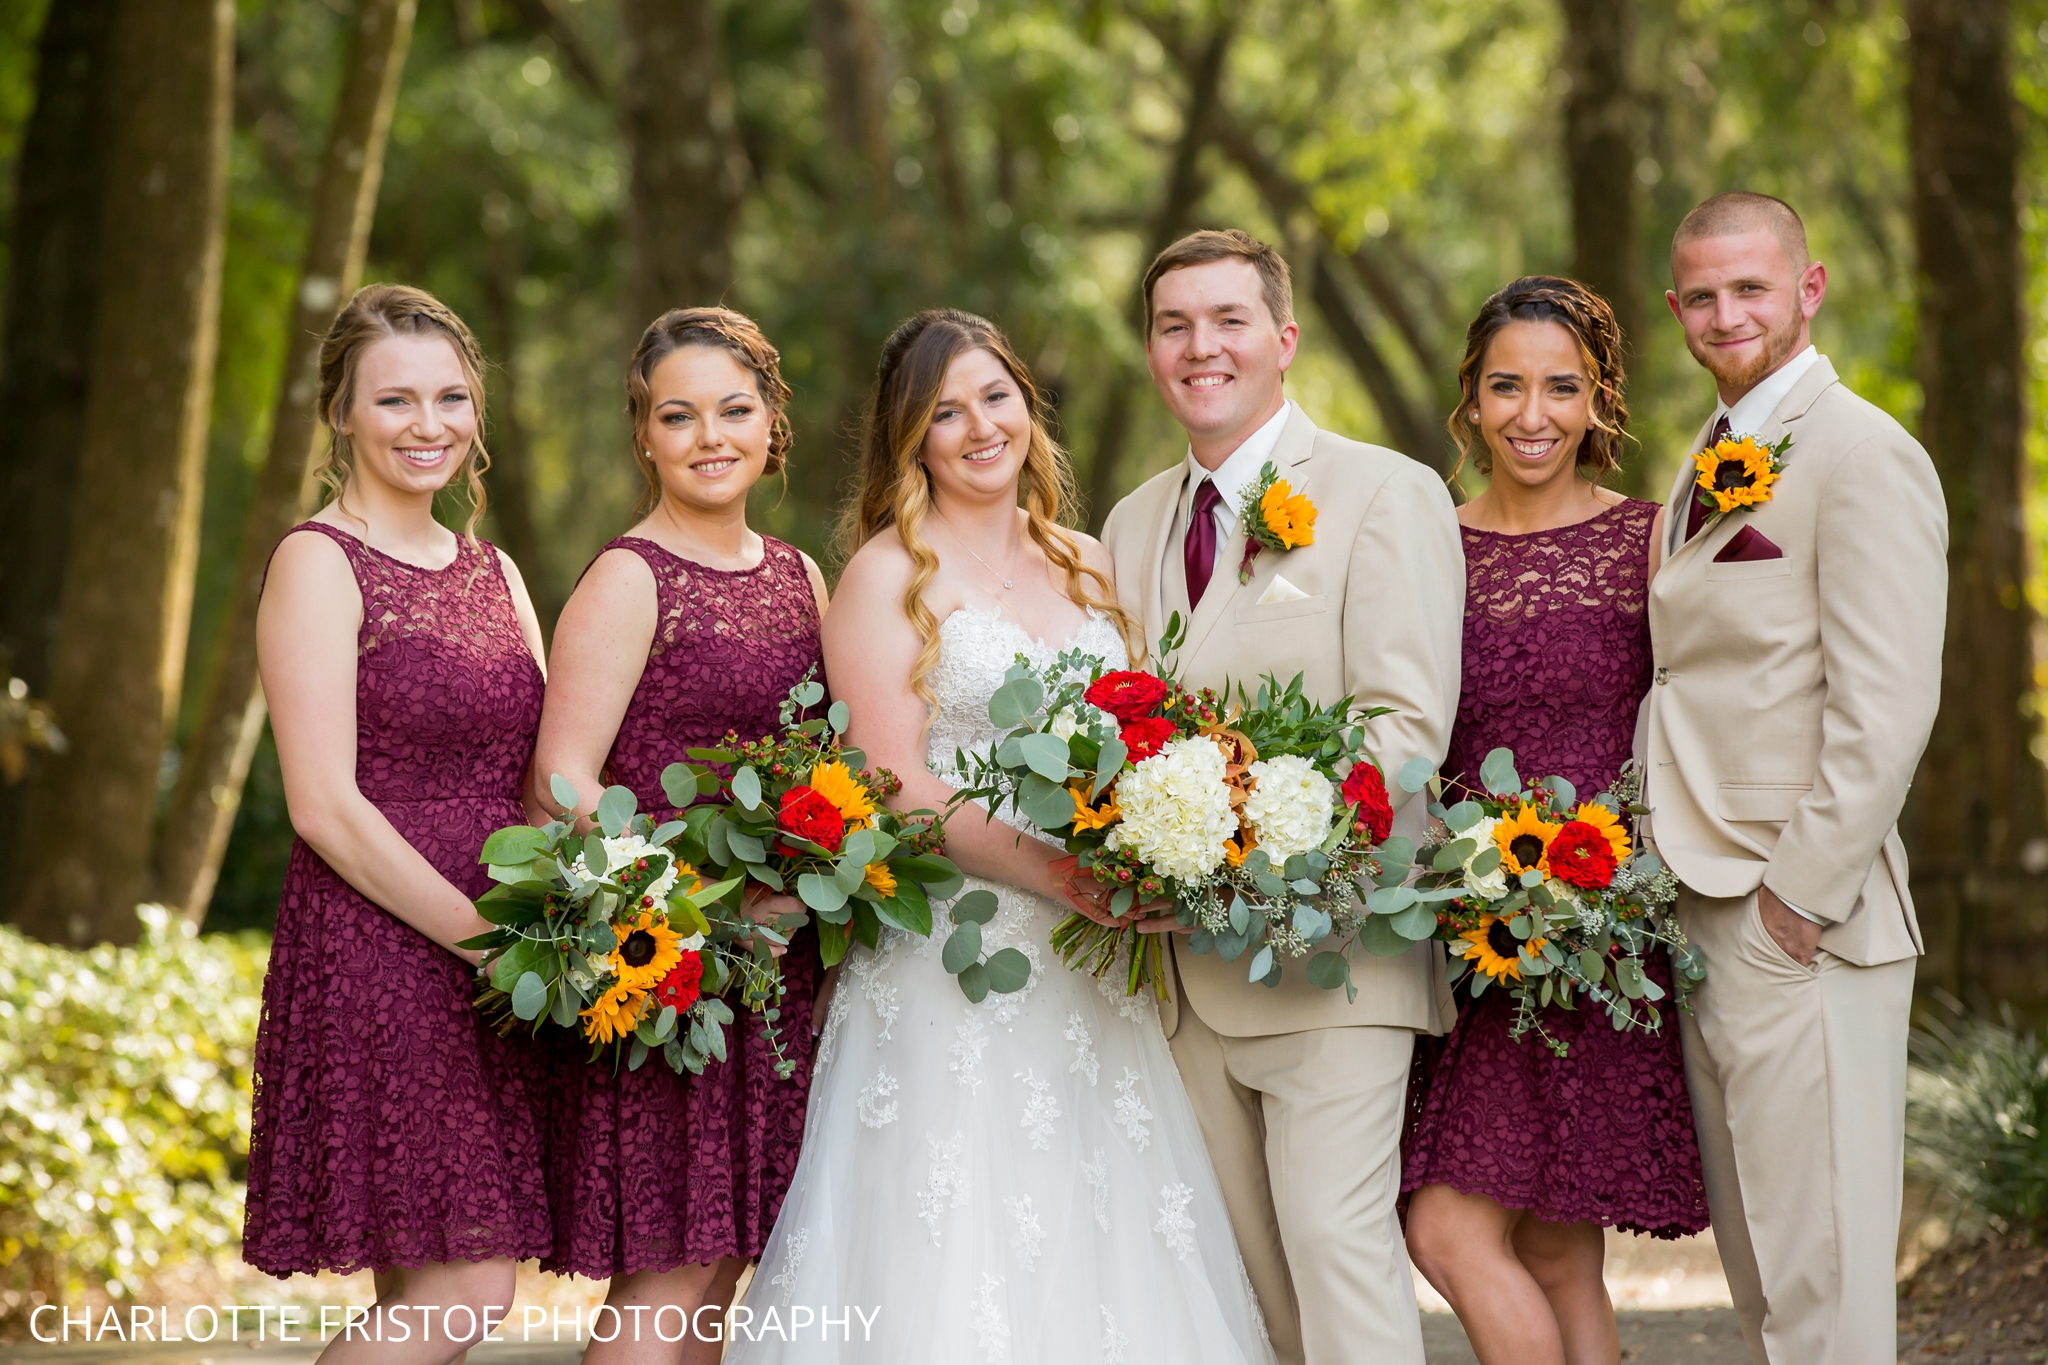 Tallahassee_Wedding_Charlotte_Fristoe-41.jpg